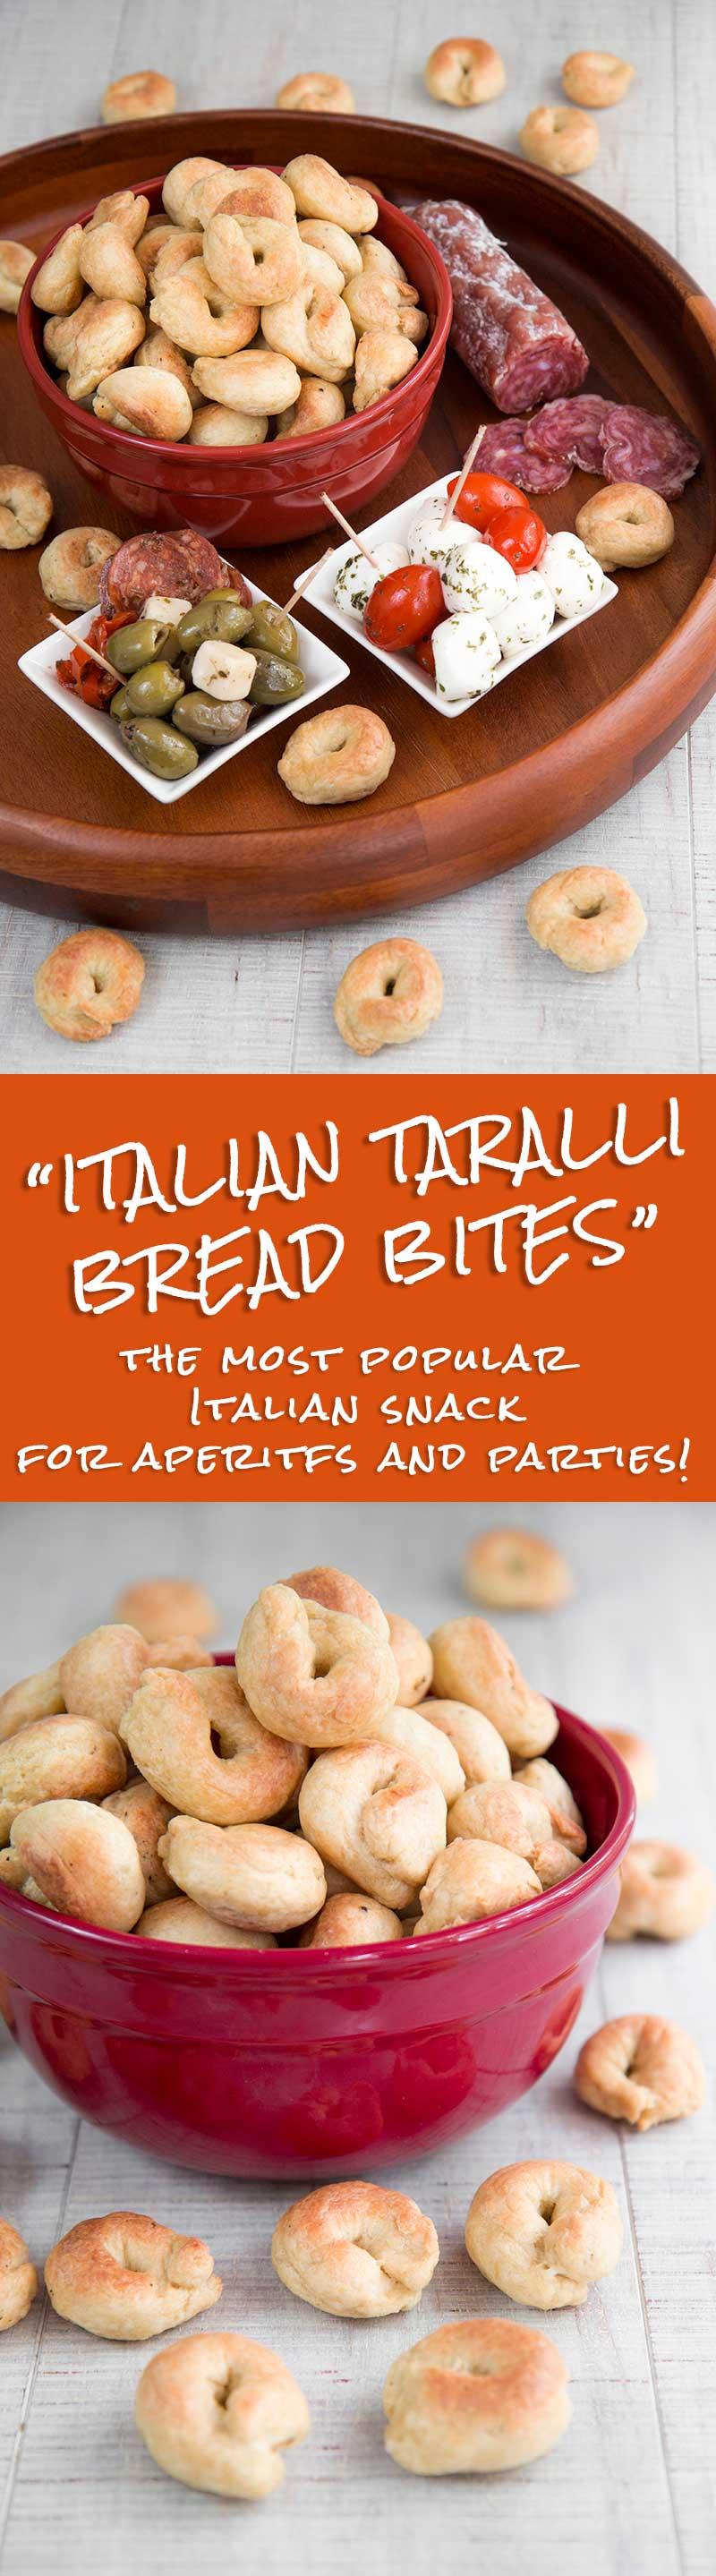 TARALLI RECIPE - Traditional Italian bread snacks for aperitifs and parties!